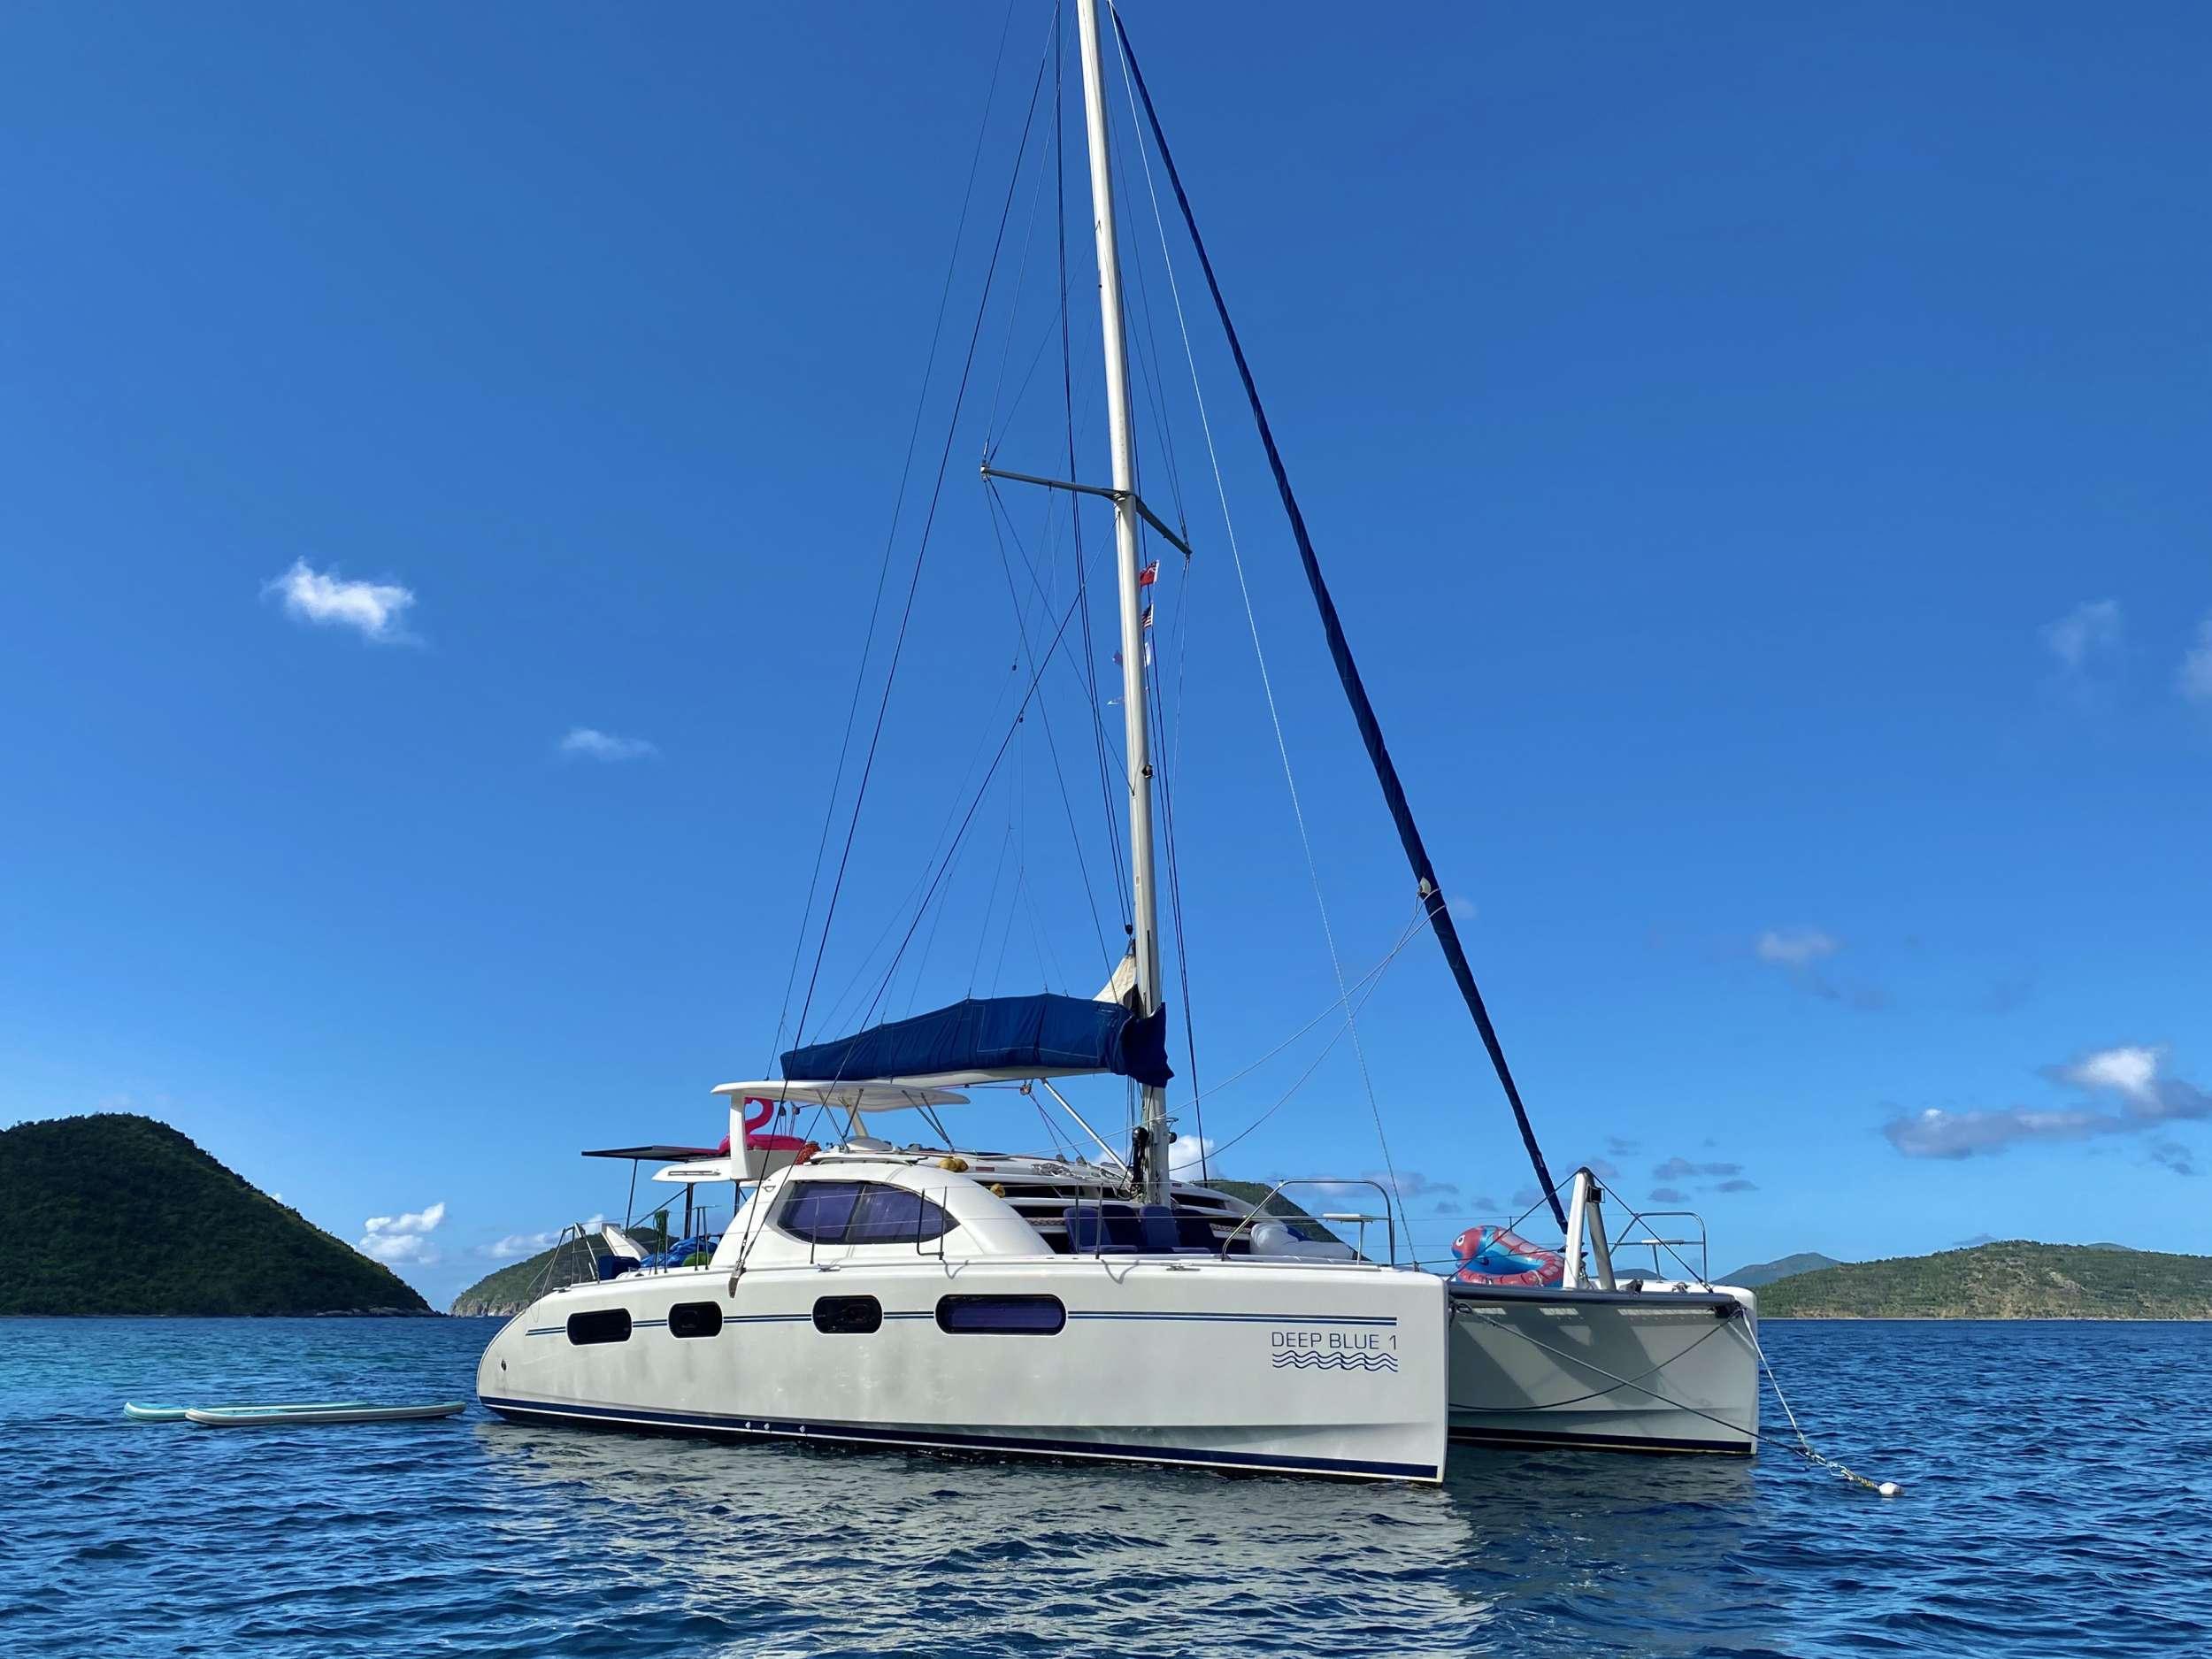 Main image of DEEPBLUE yacht